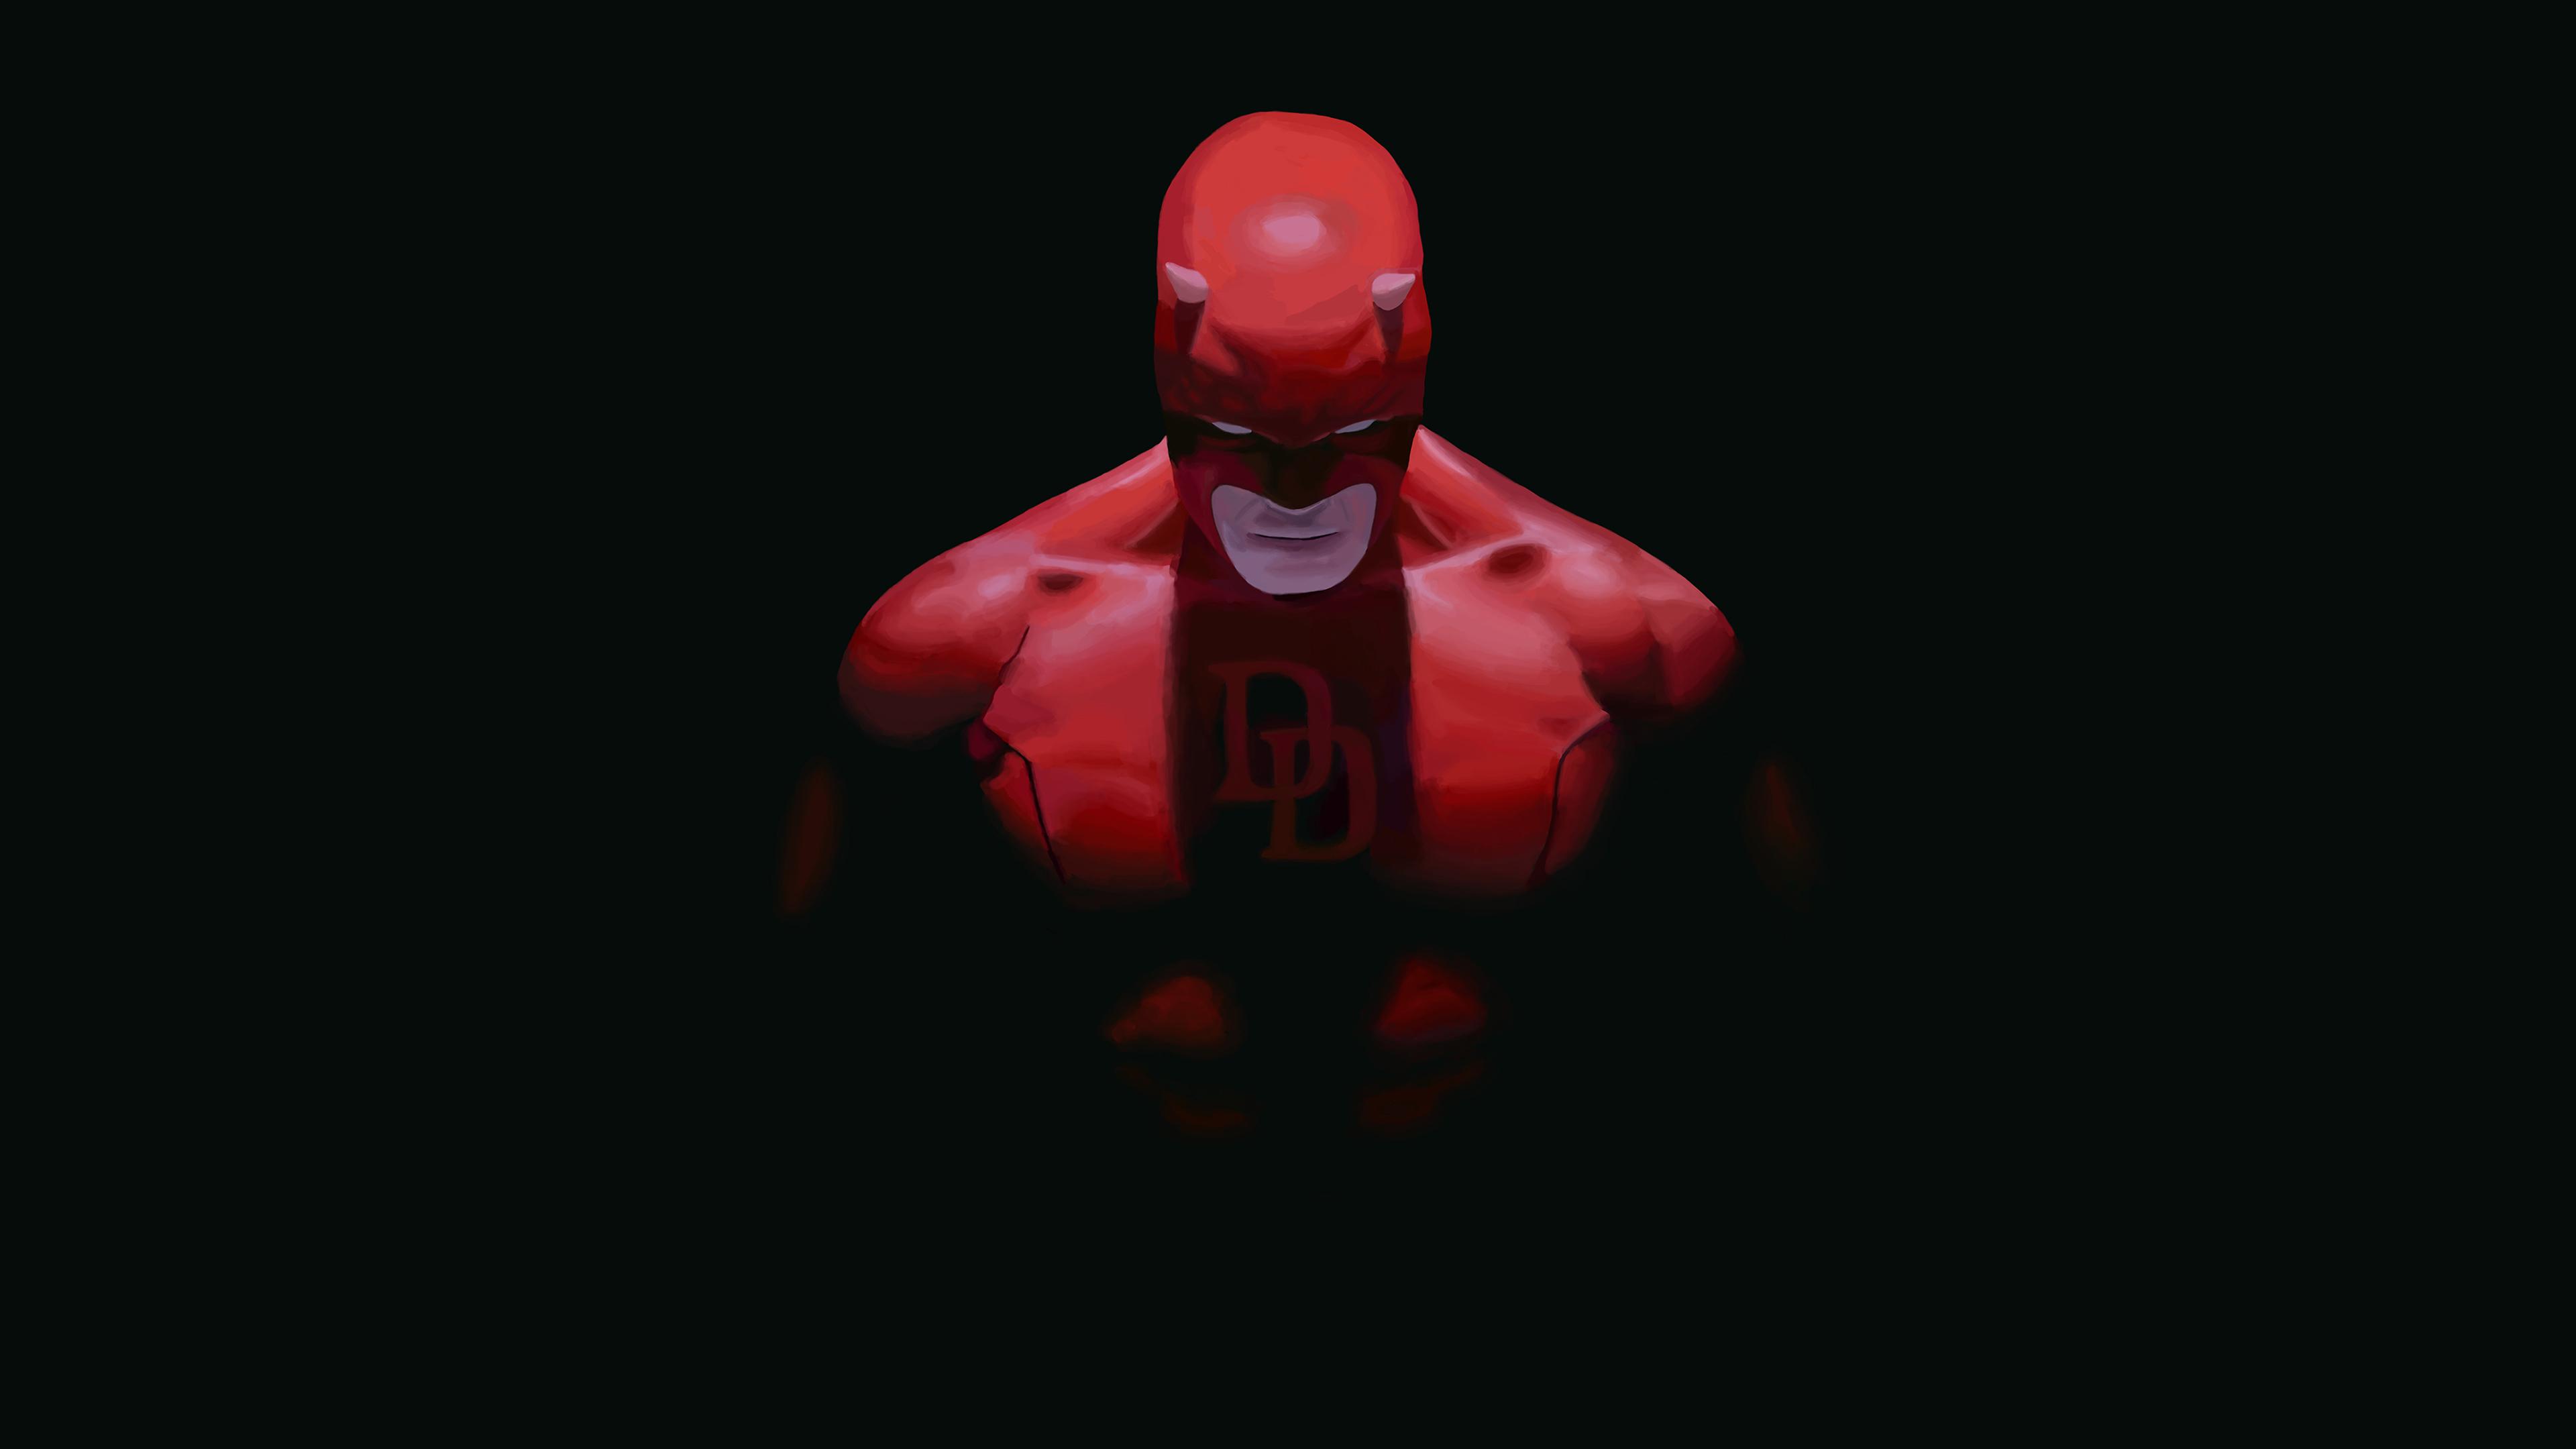 Wallpaper 4k Daredevil New Art 4k 4k Wallpapers Artwork Wallpapers Behance Wallpapers Daredevil Wallpapers Hd Wallpapers Superheroes Wallpapers